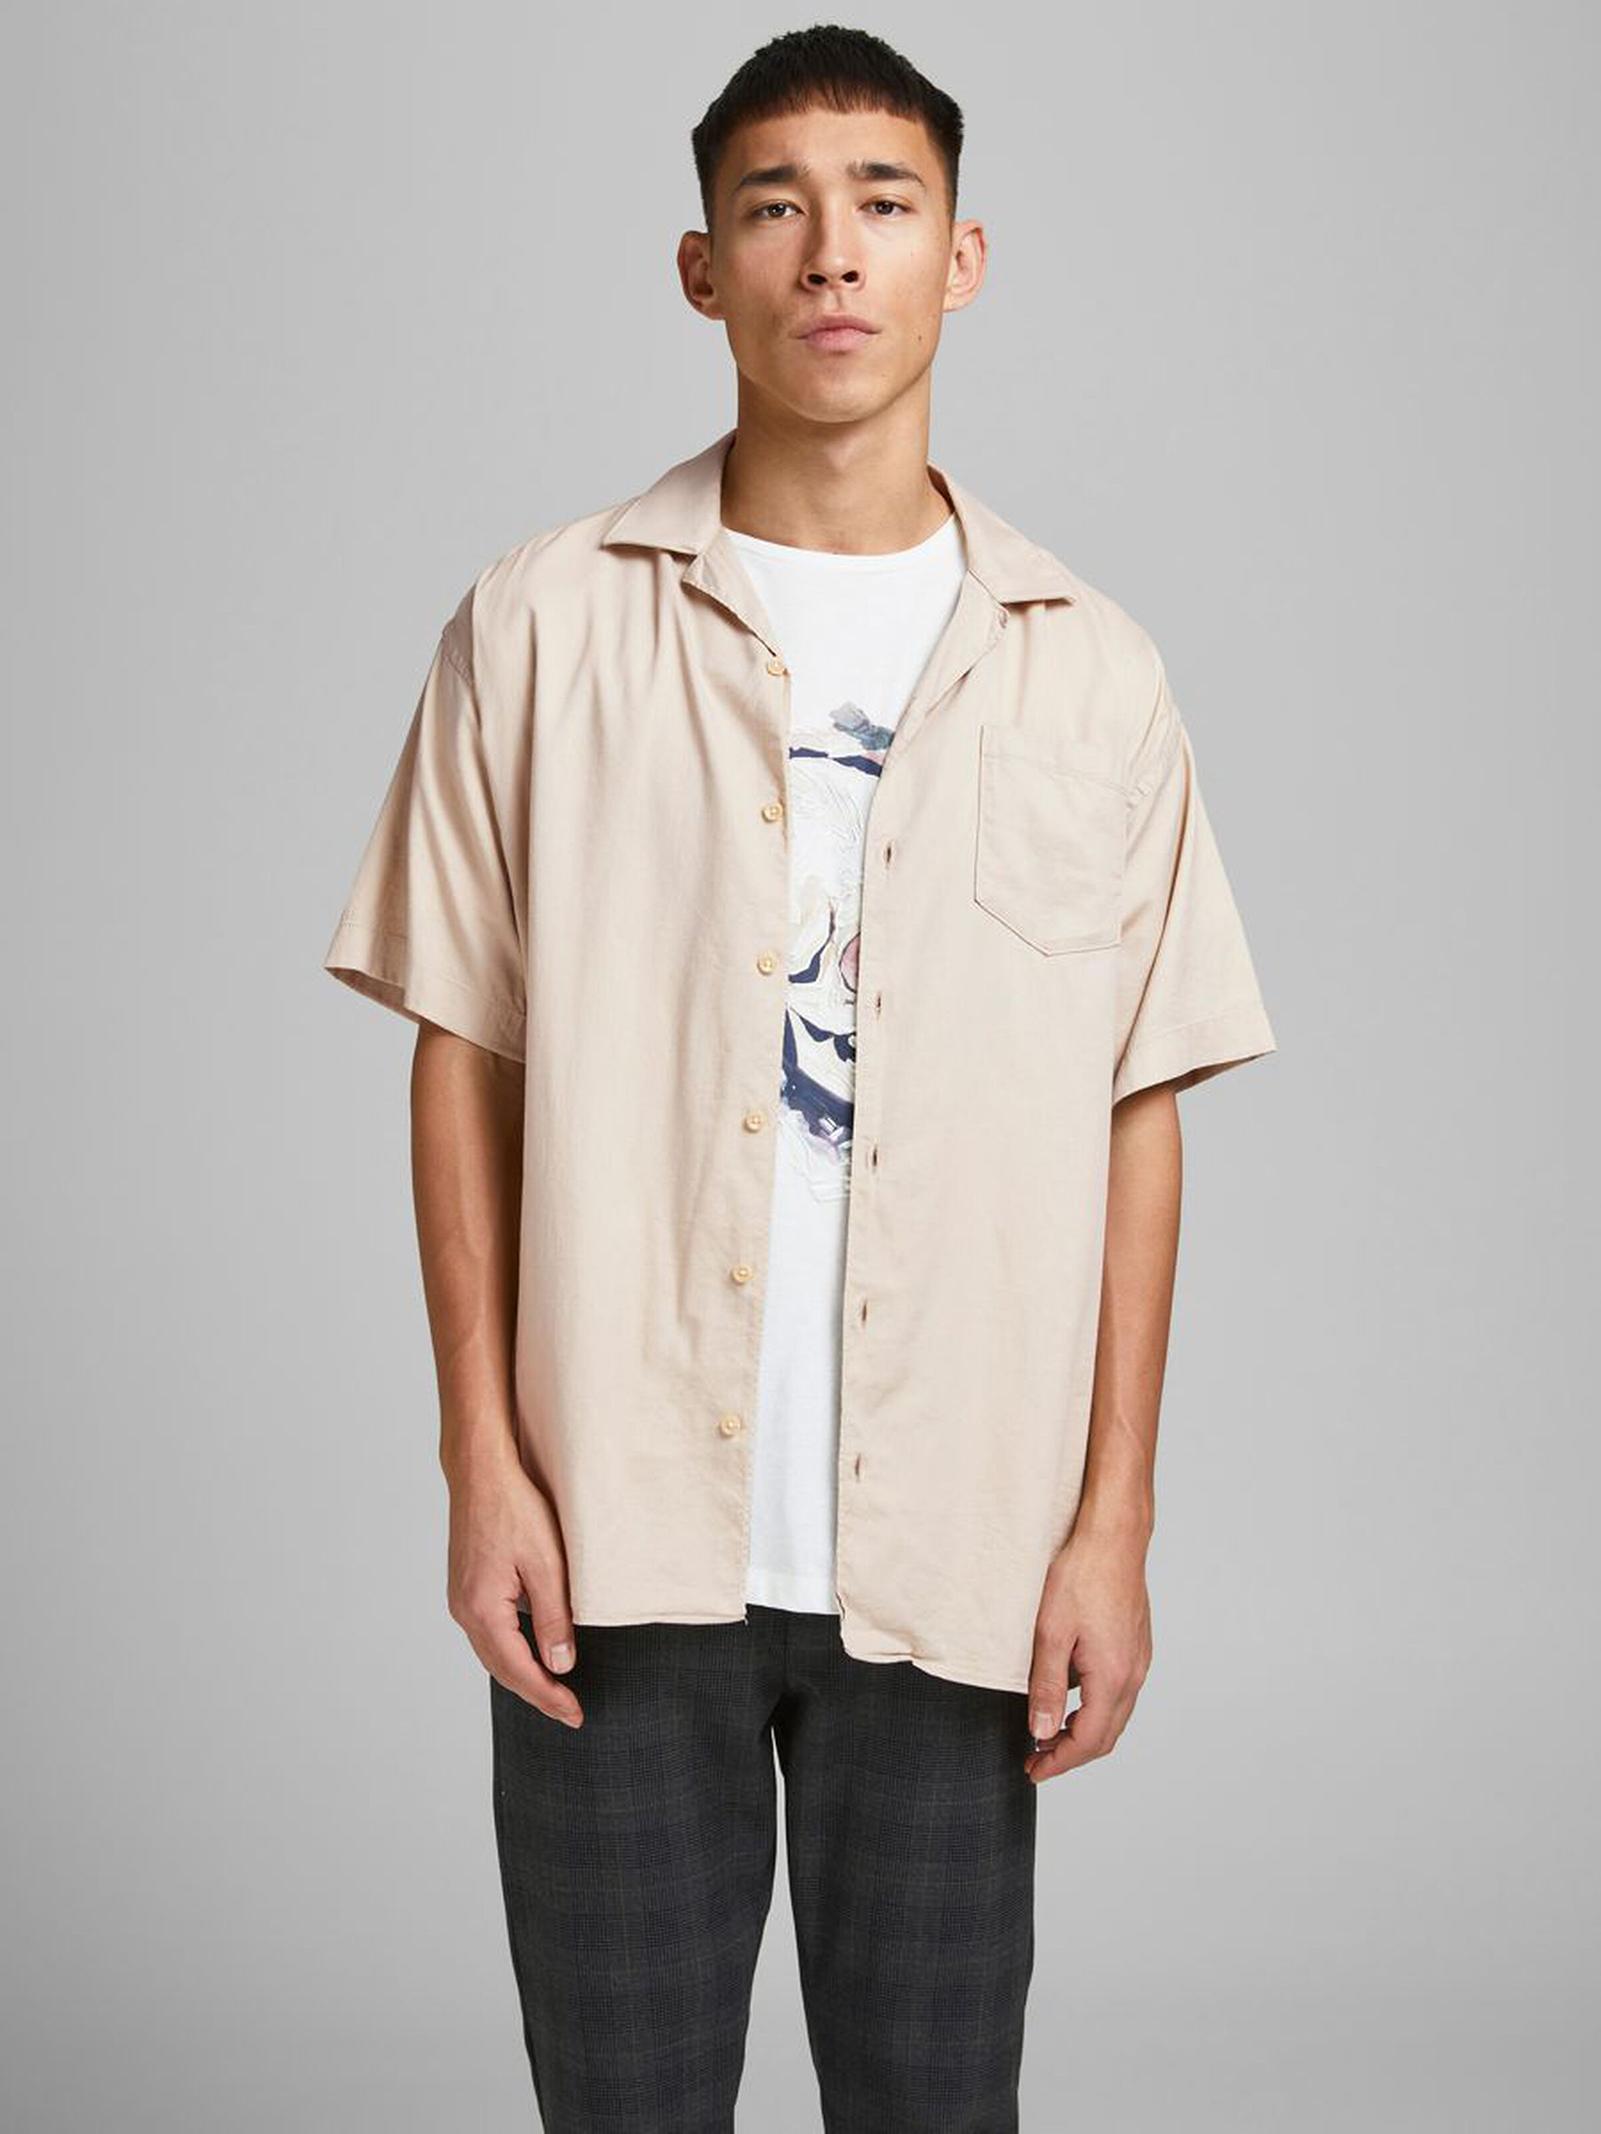 Shirt JACK & JONES | Shirts | 12183614BEIGE